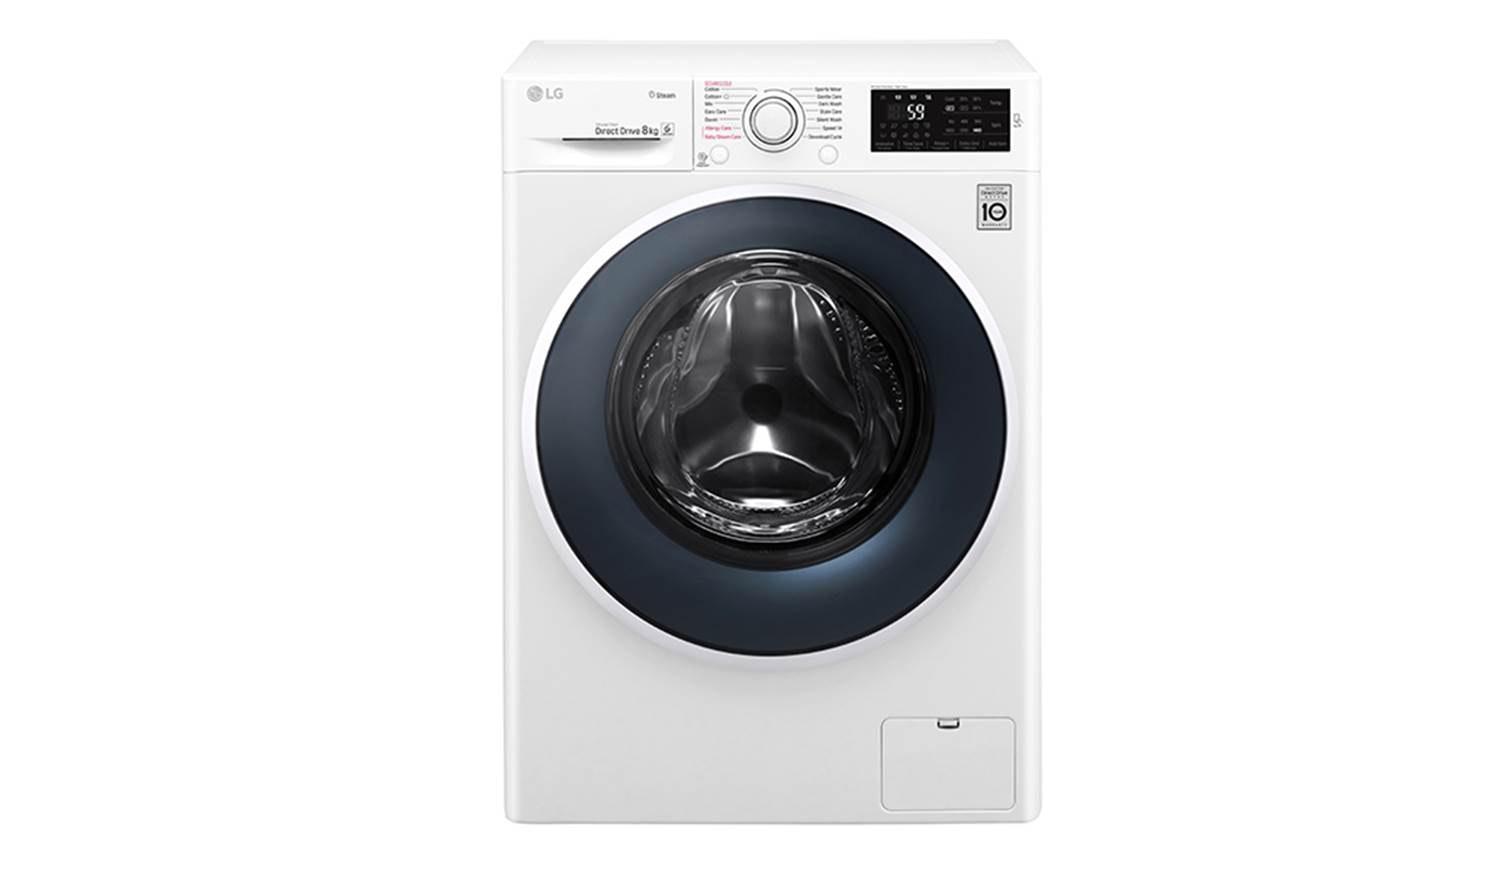 lg fc1408s4w 8kg 6 motion inverter direct drive washer